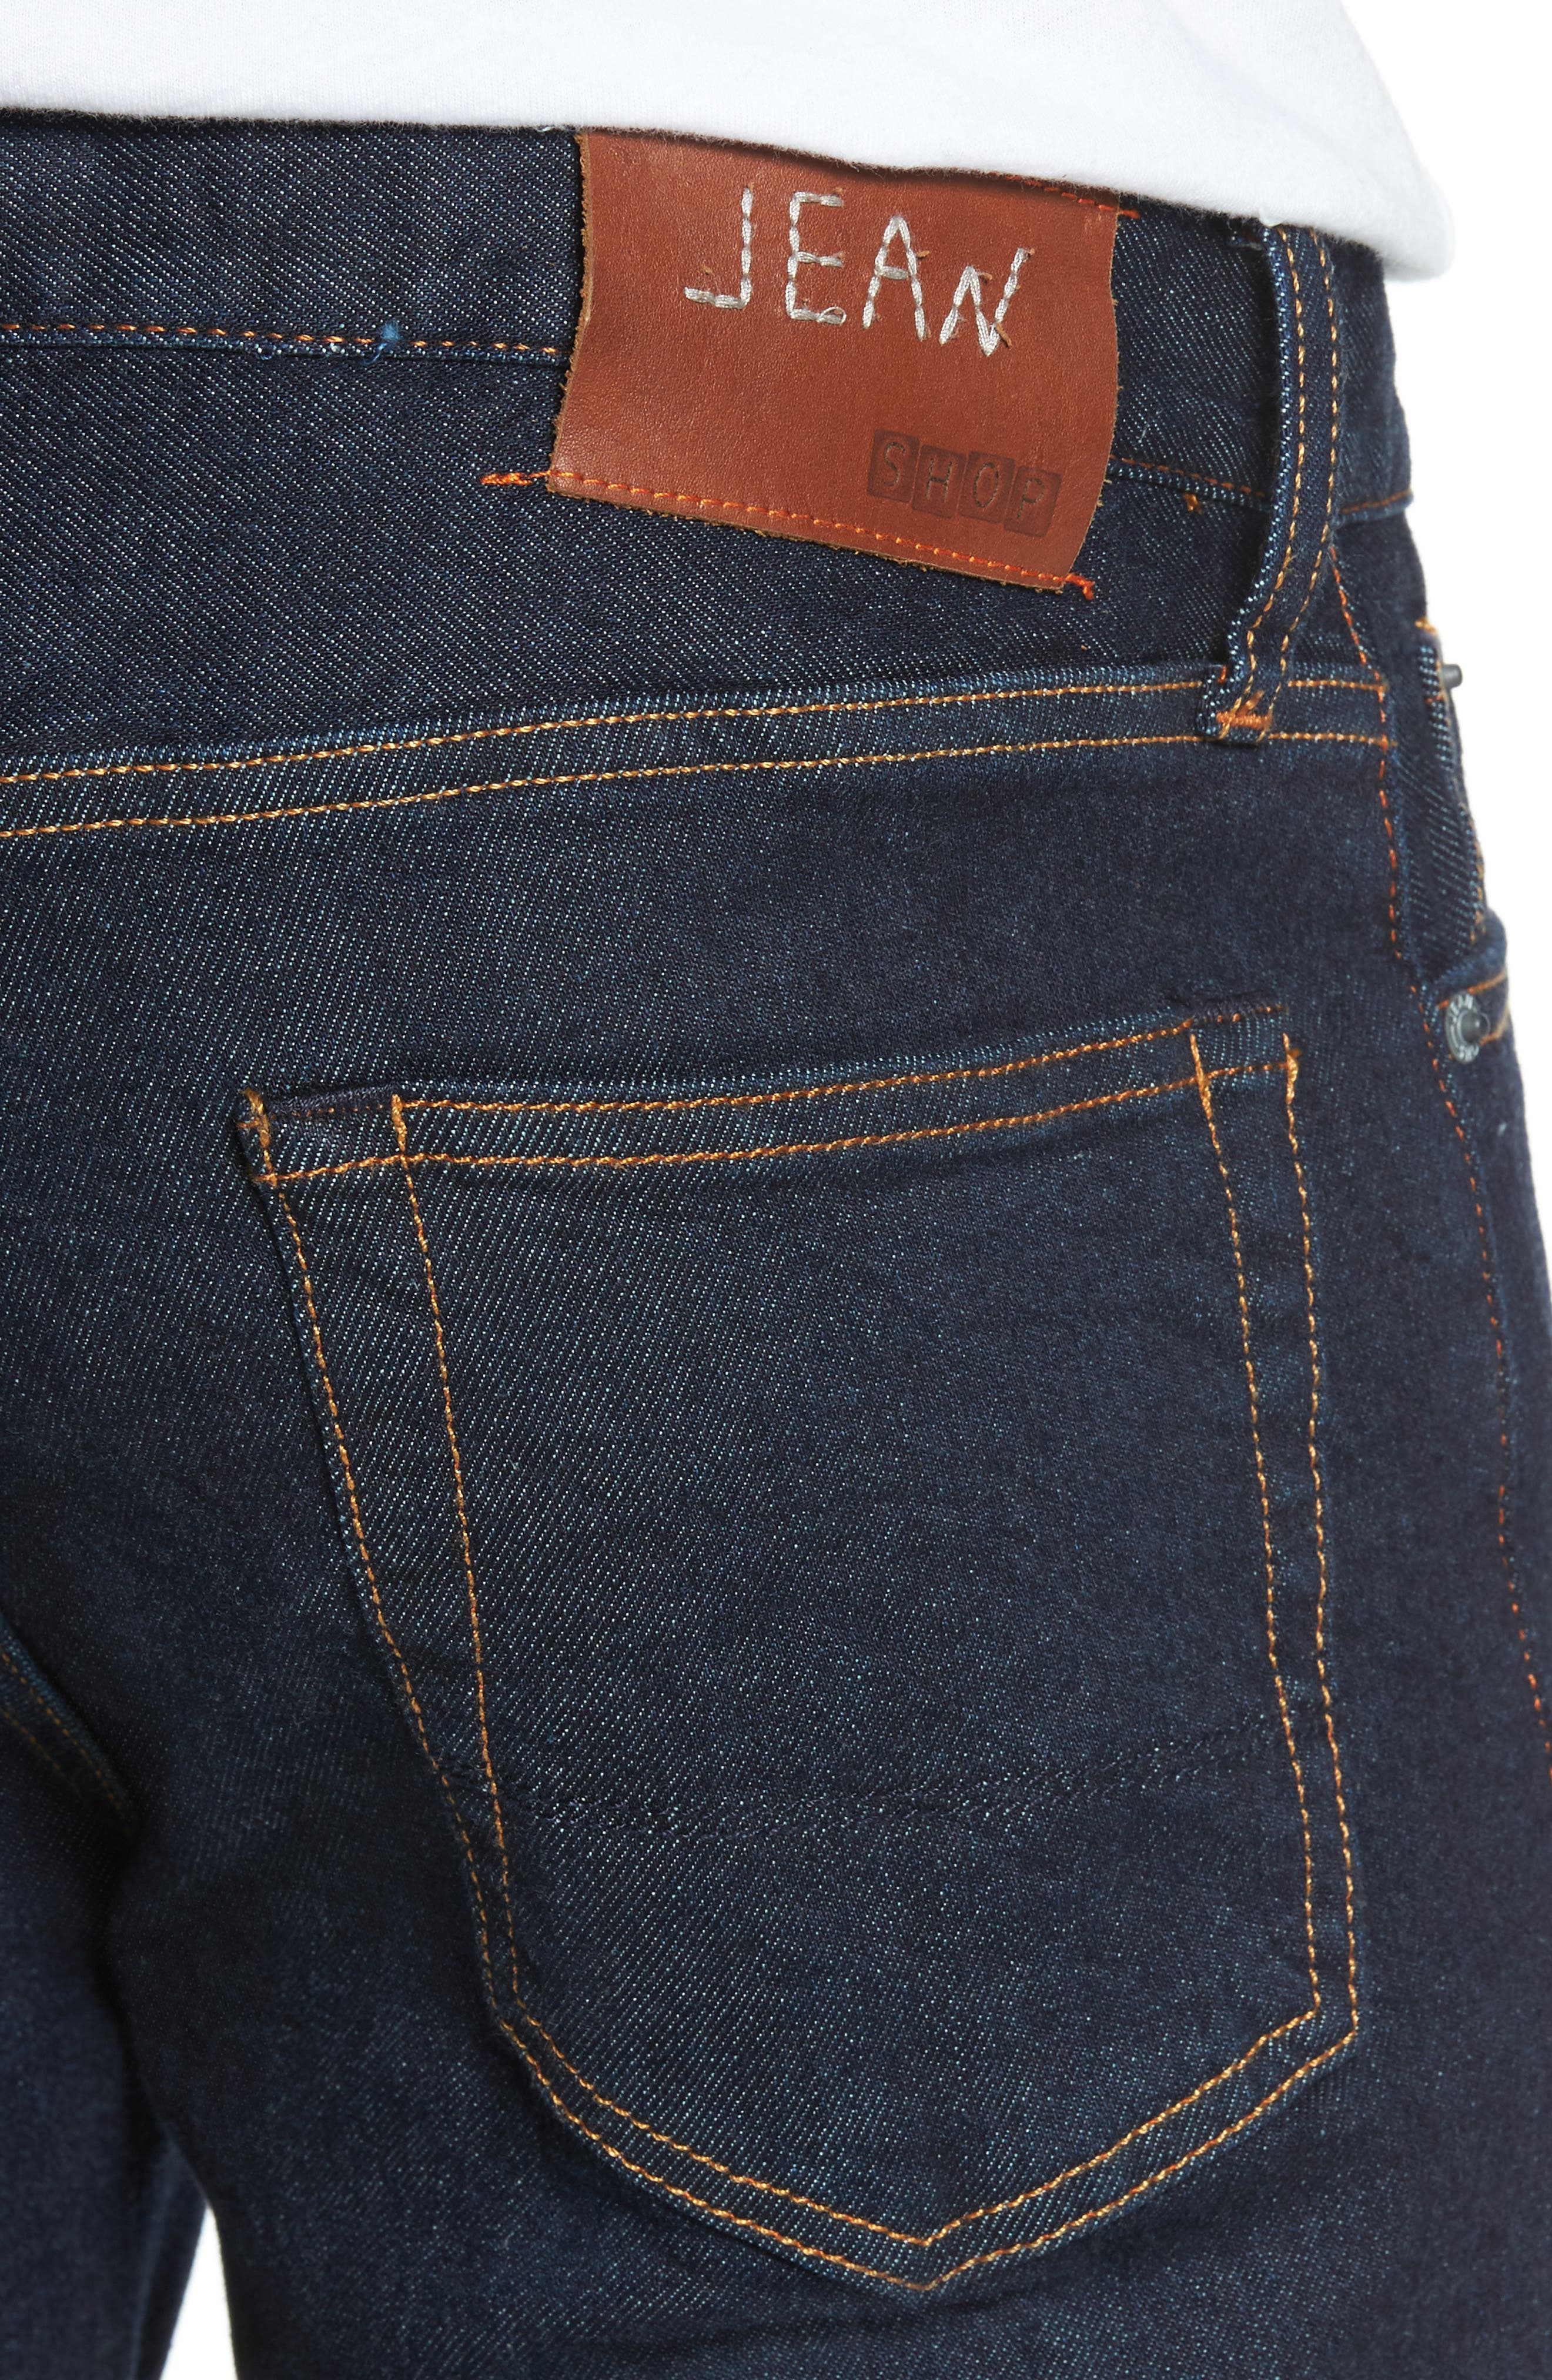 Jim Slim Fit Selvedge Jeans,                             Alternate thumbnail 4, color,                             460